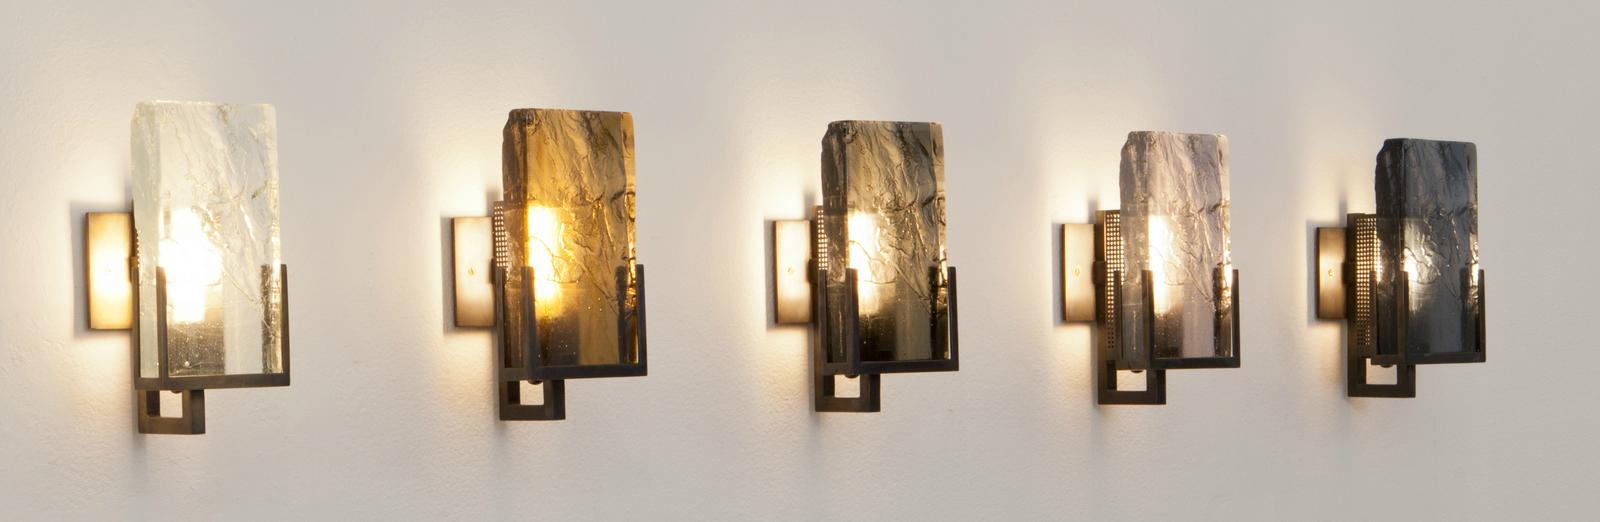 Lianne Gold - ICE lighting & MoD Design Guru - Fresh Ideas + Cleverly Modern Design: MoD Must ...